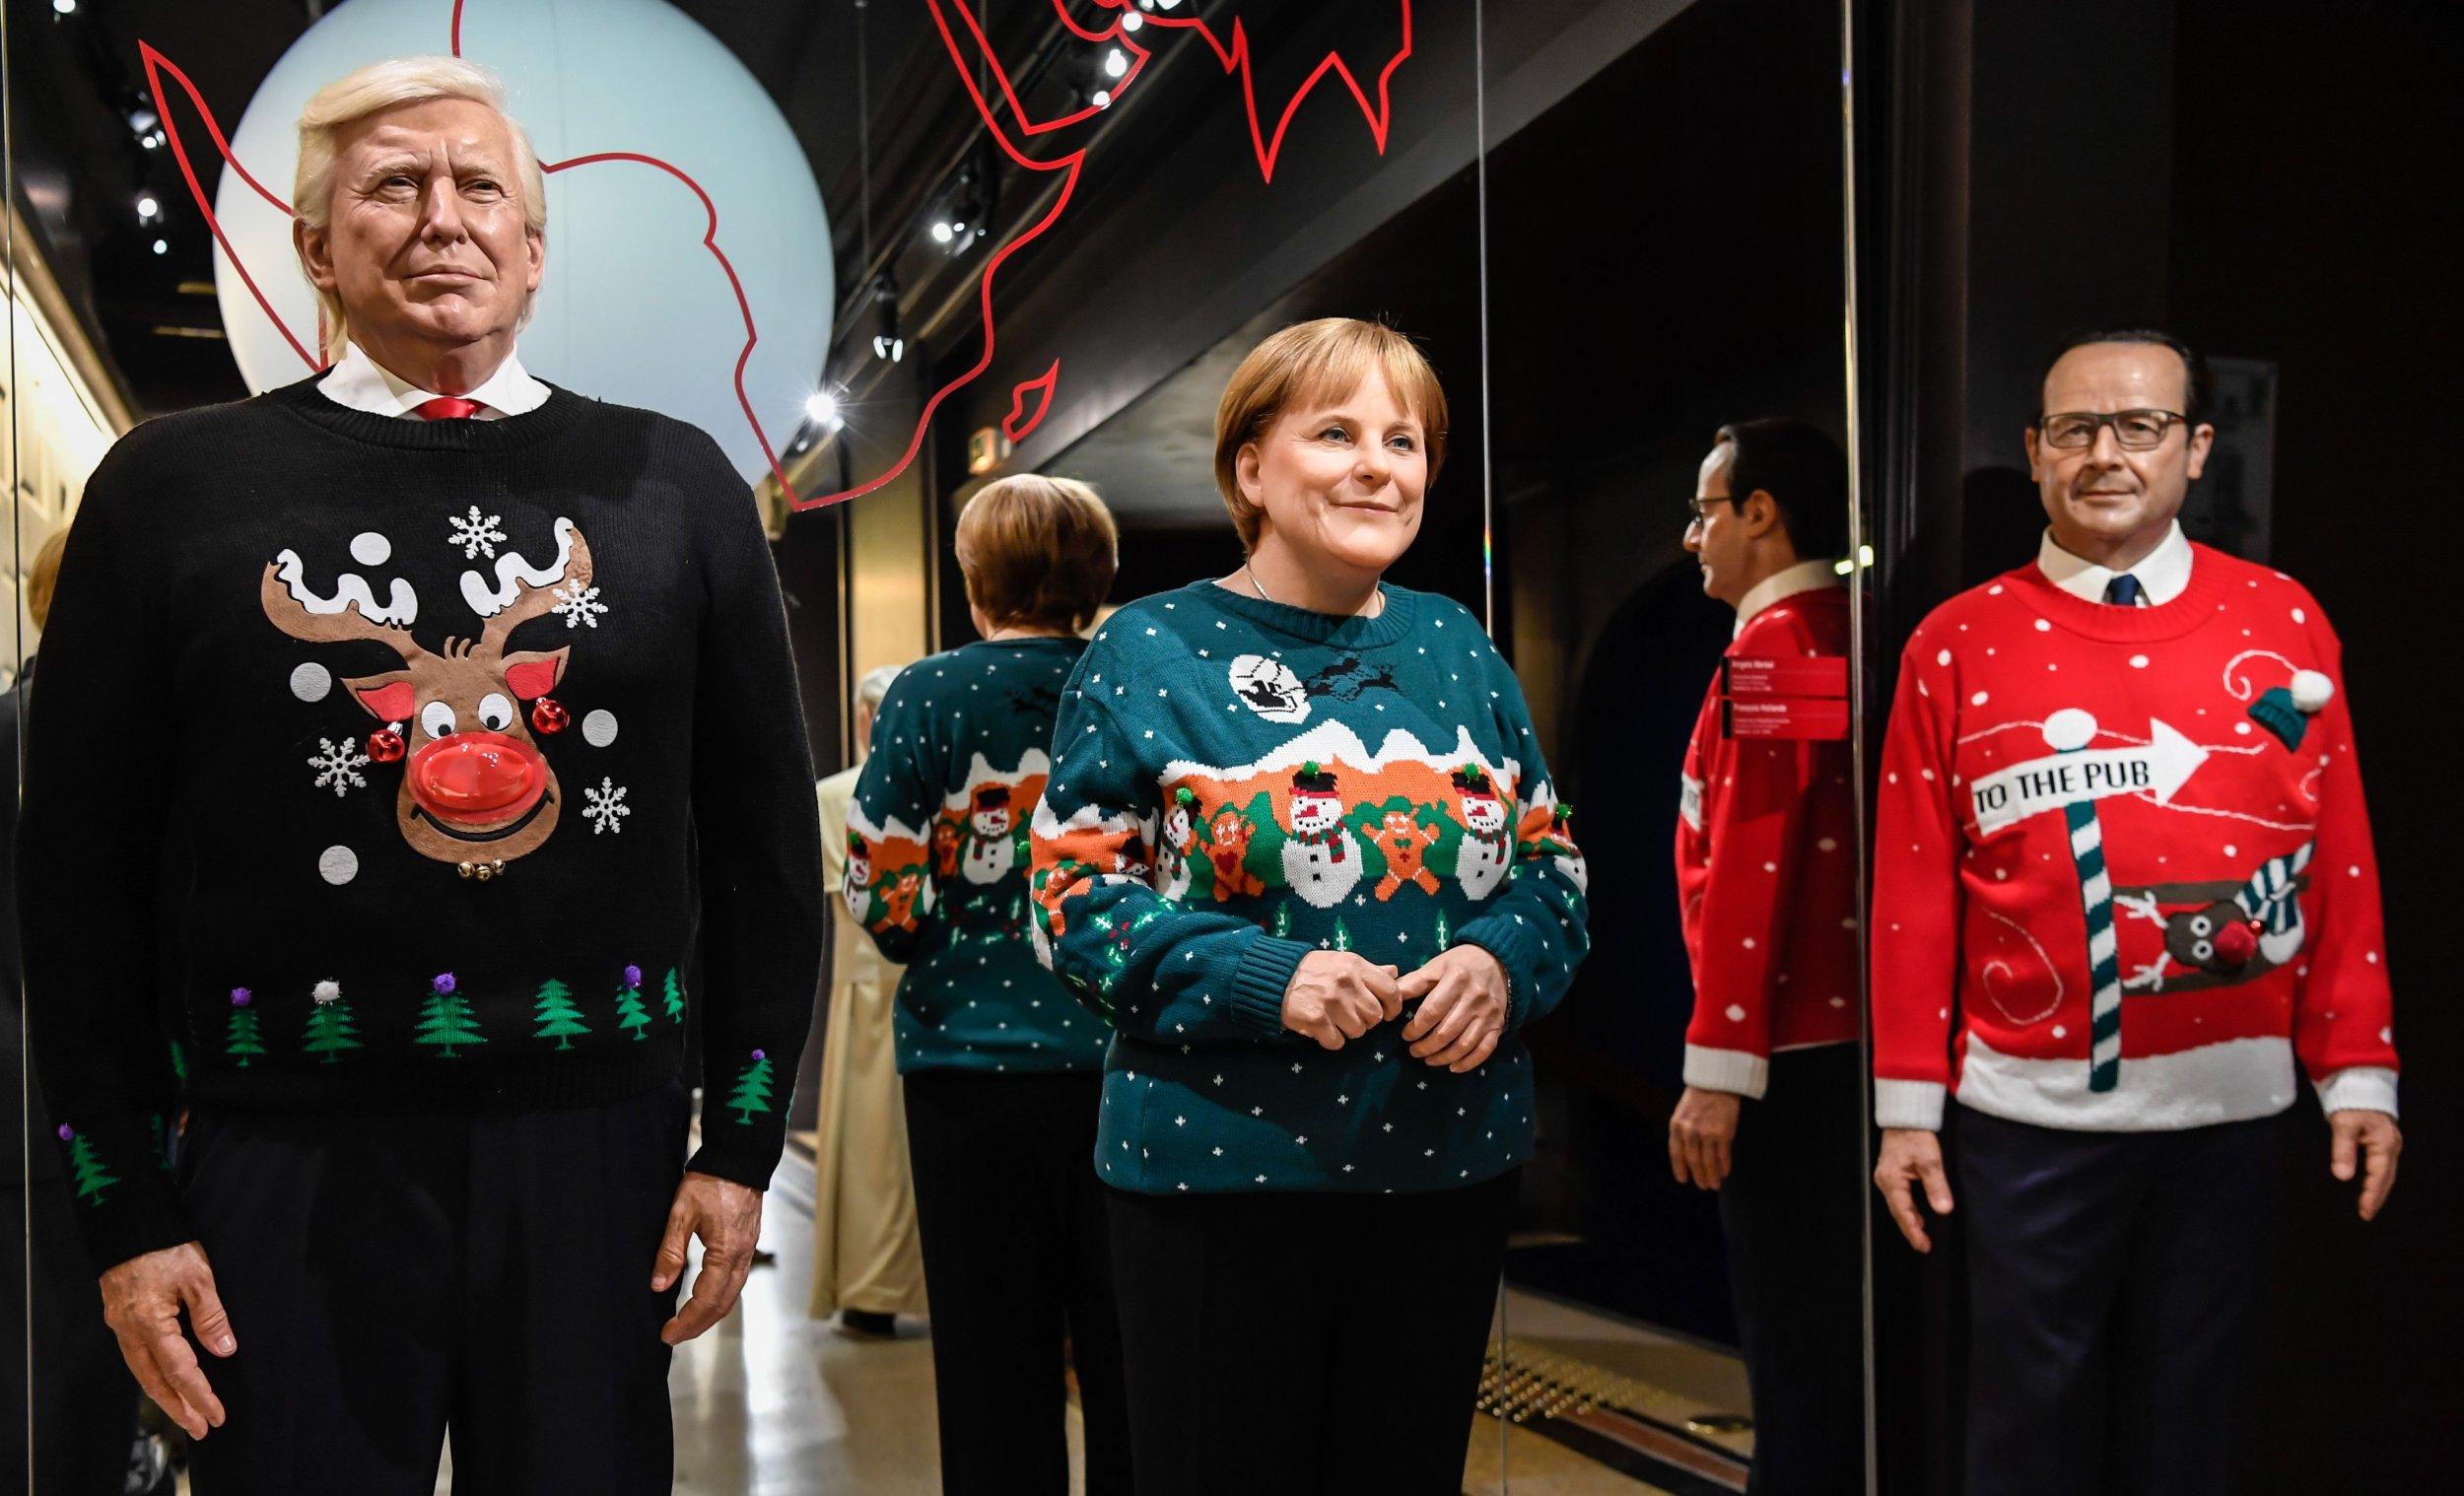 Huge Christmas Card.Donald Trump Likes Everything Big Including His Huge Christmas Card